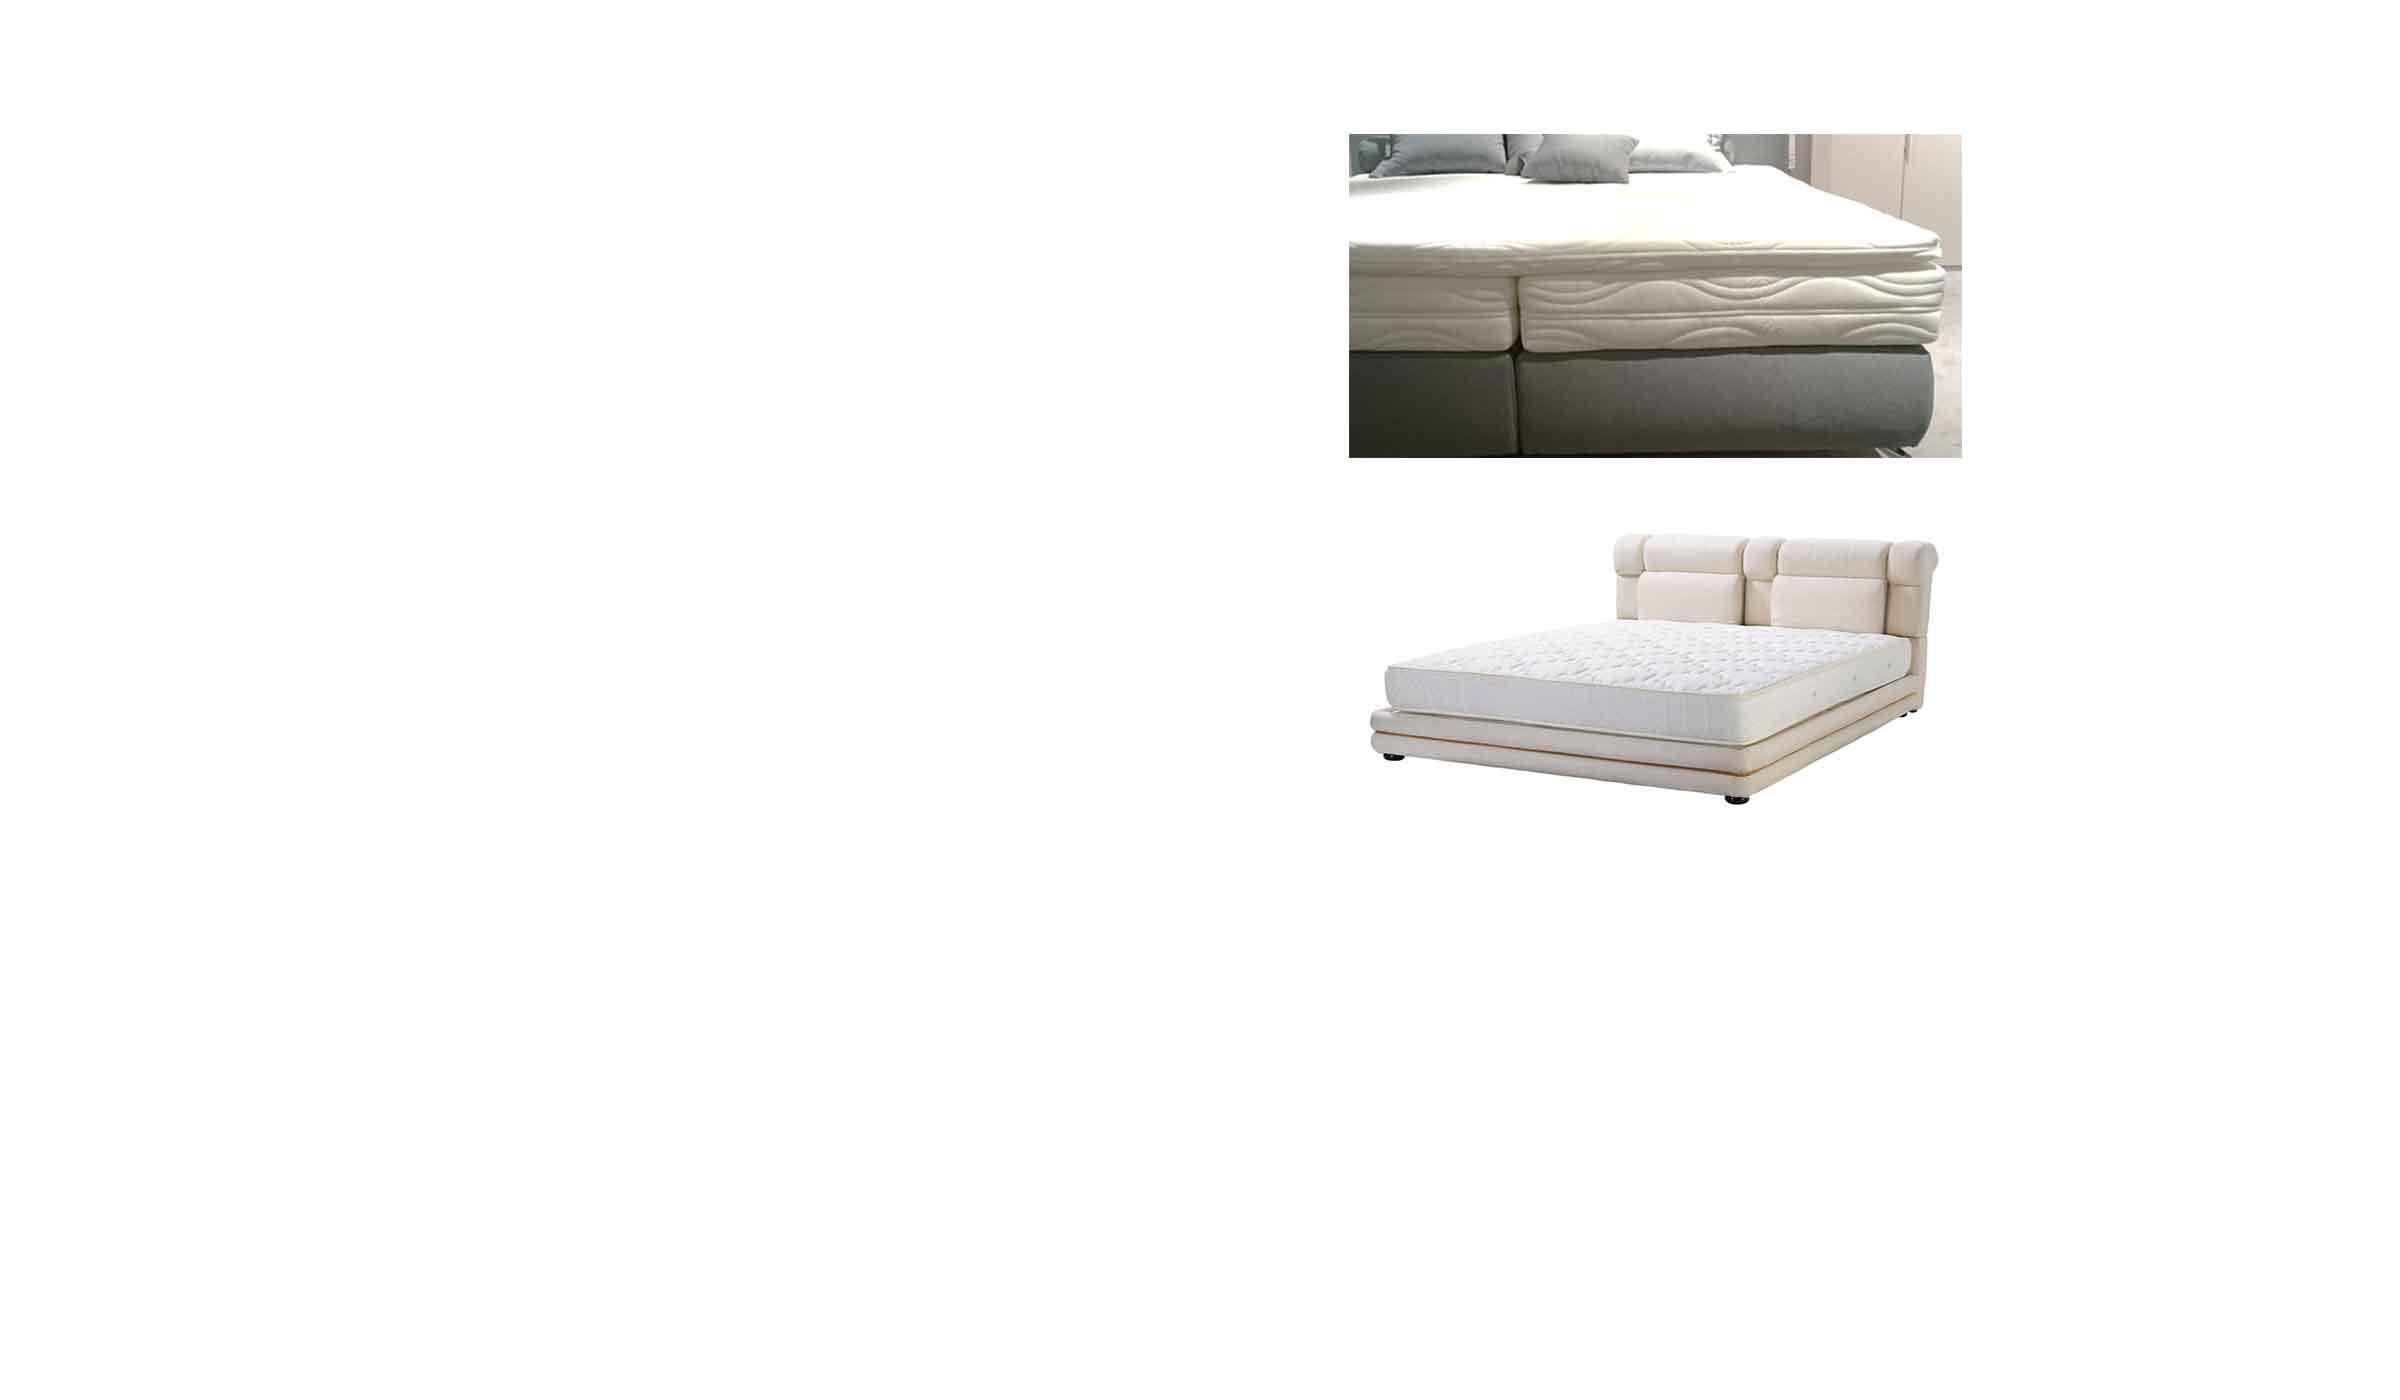 milbenschutzbezug f r matratze allergo natur allergo natur. Black Bedroom Furniture Sets. Home Design Ideas